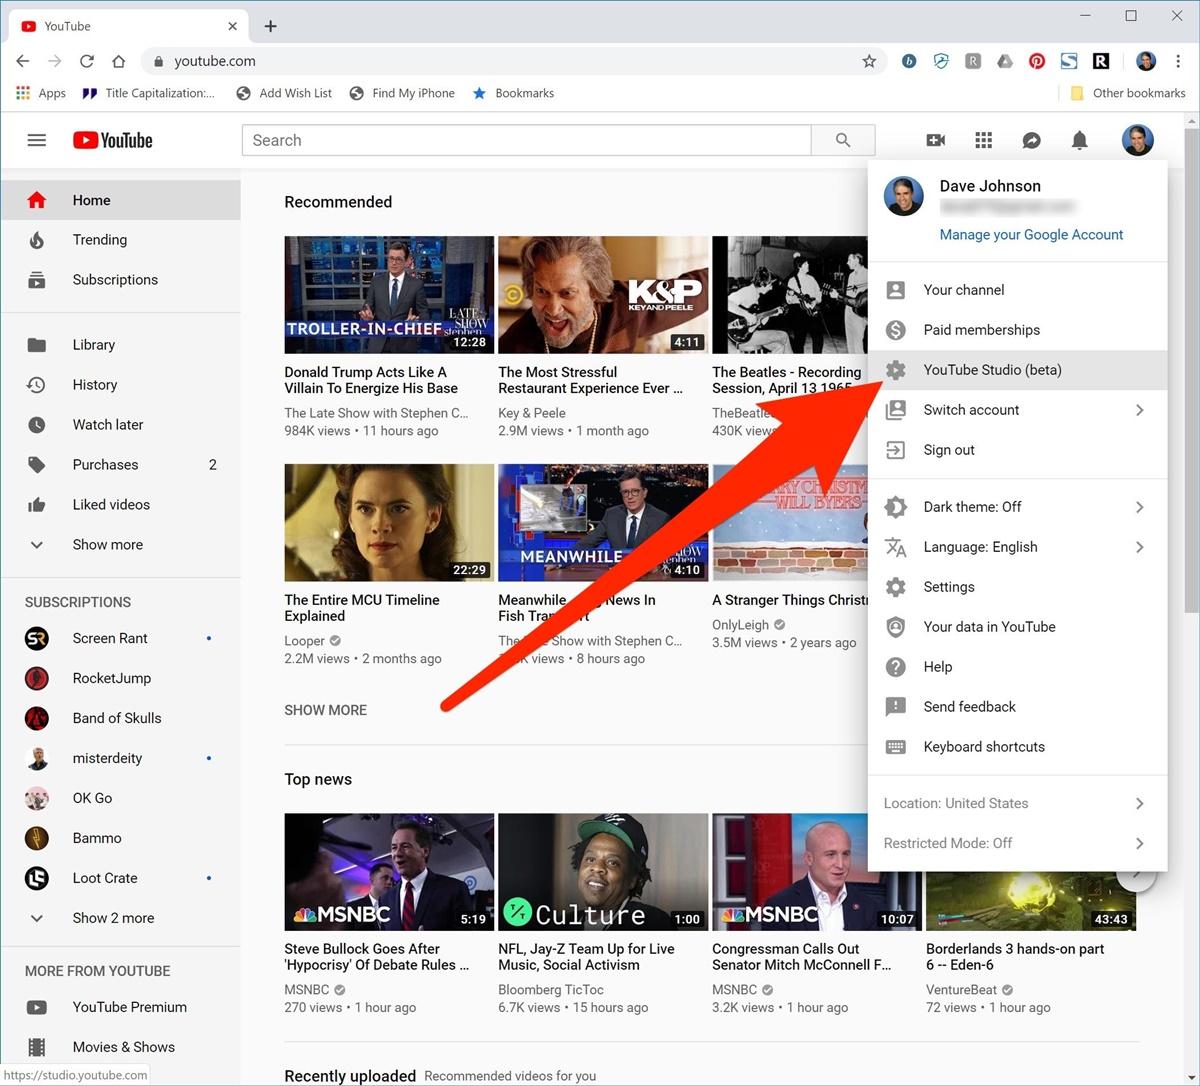 Access to Youtube Studio